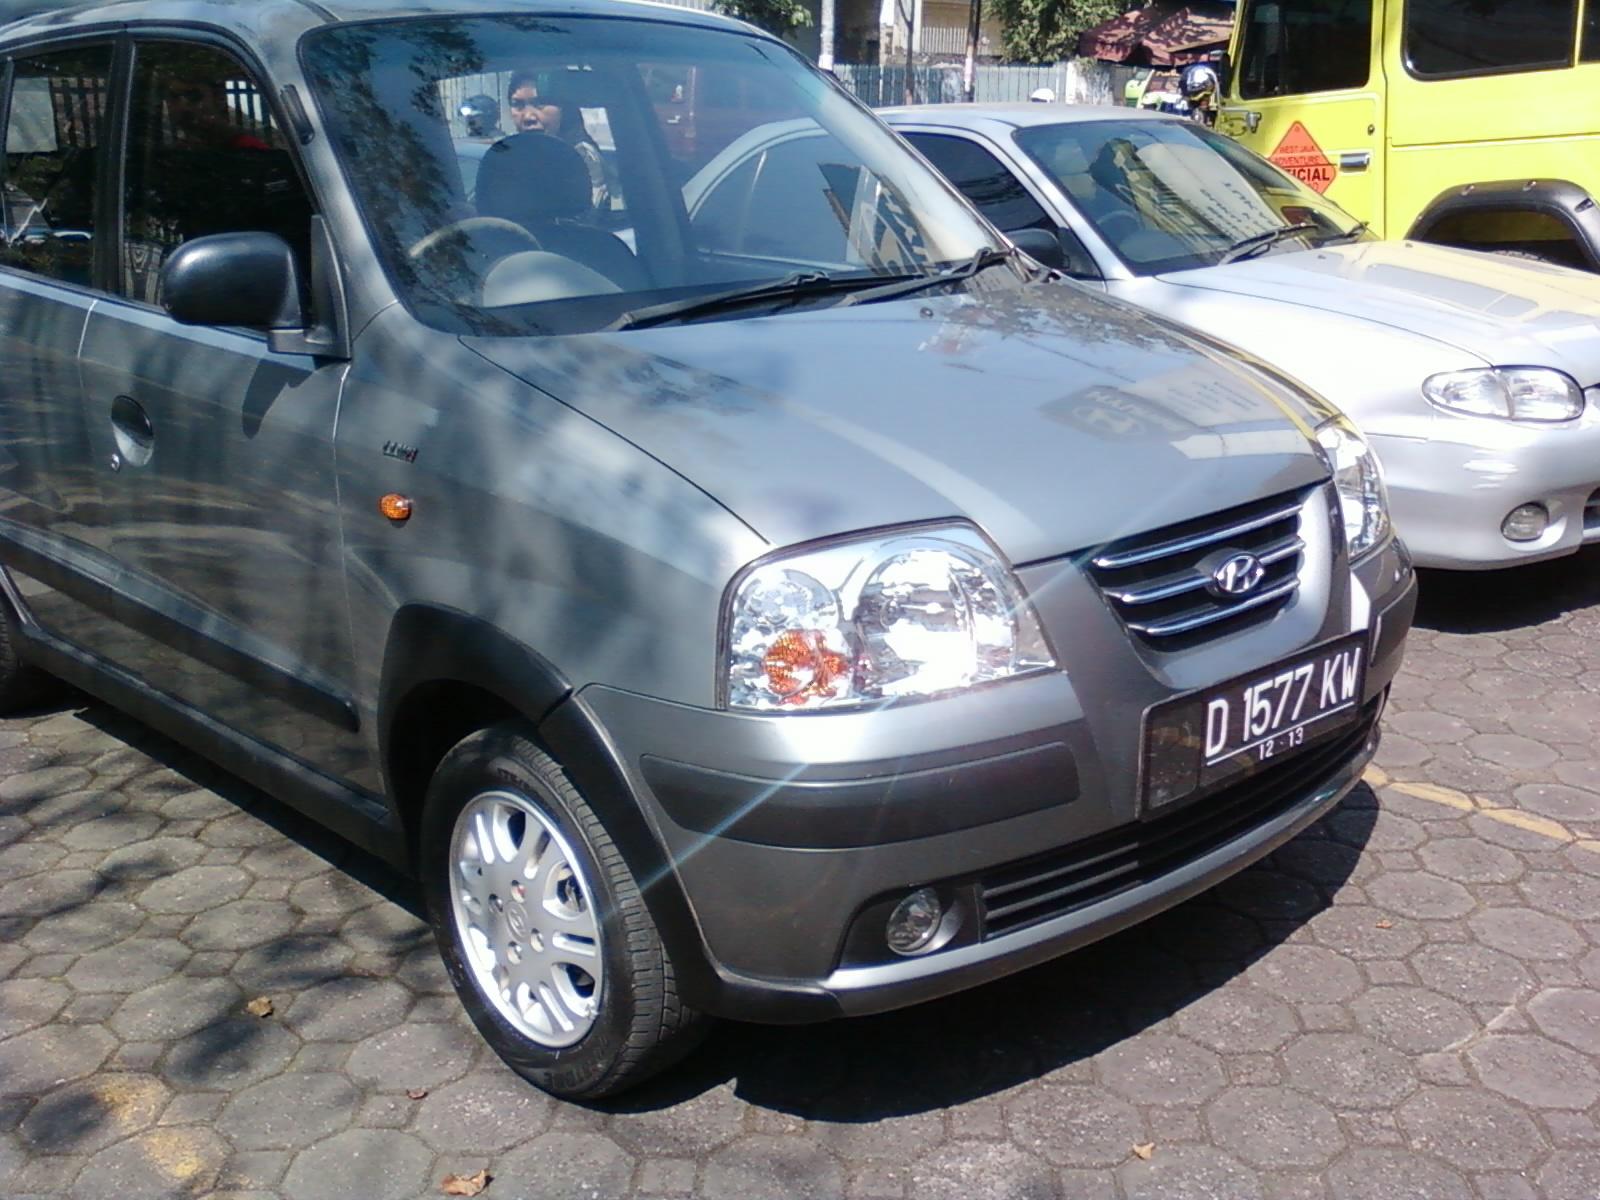 Modifikasi Mobil Hyundai Matrix | Ottomania86